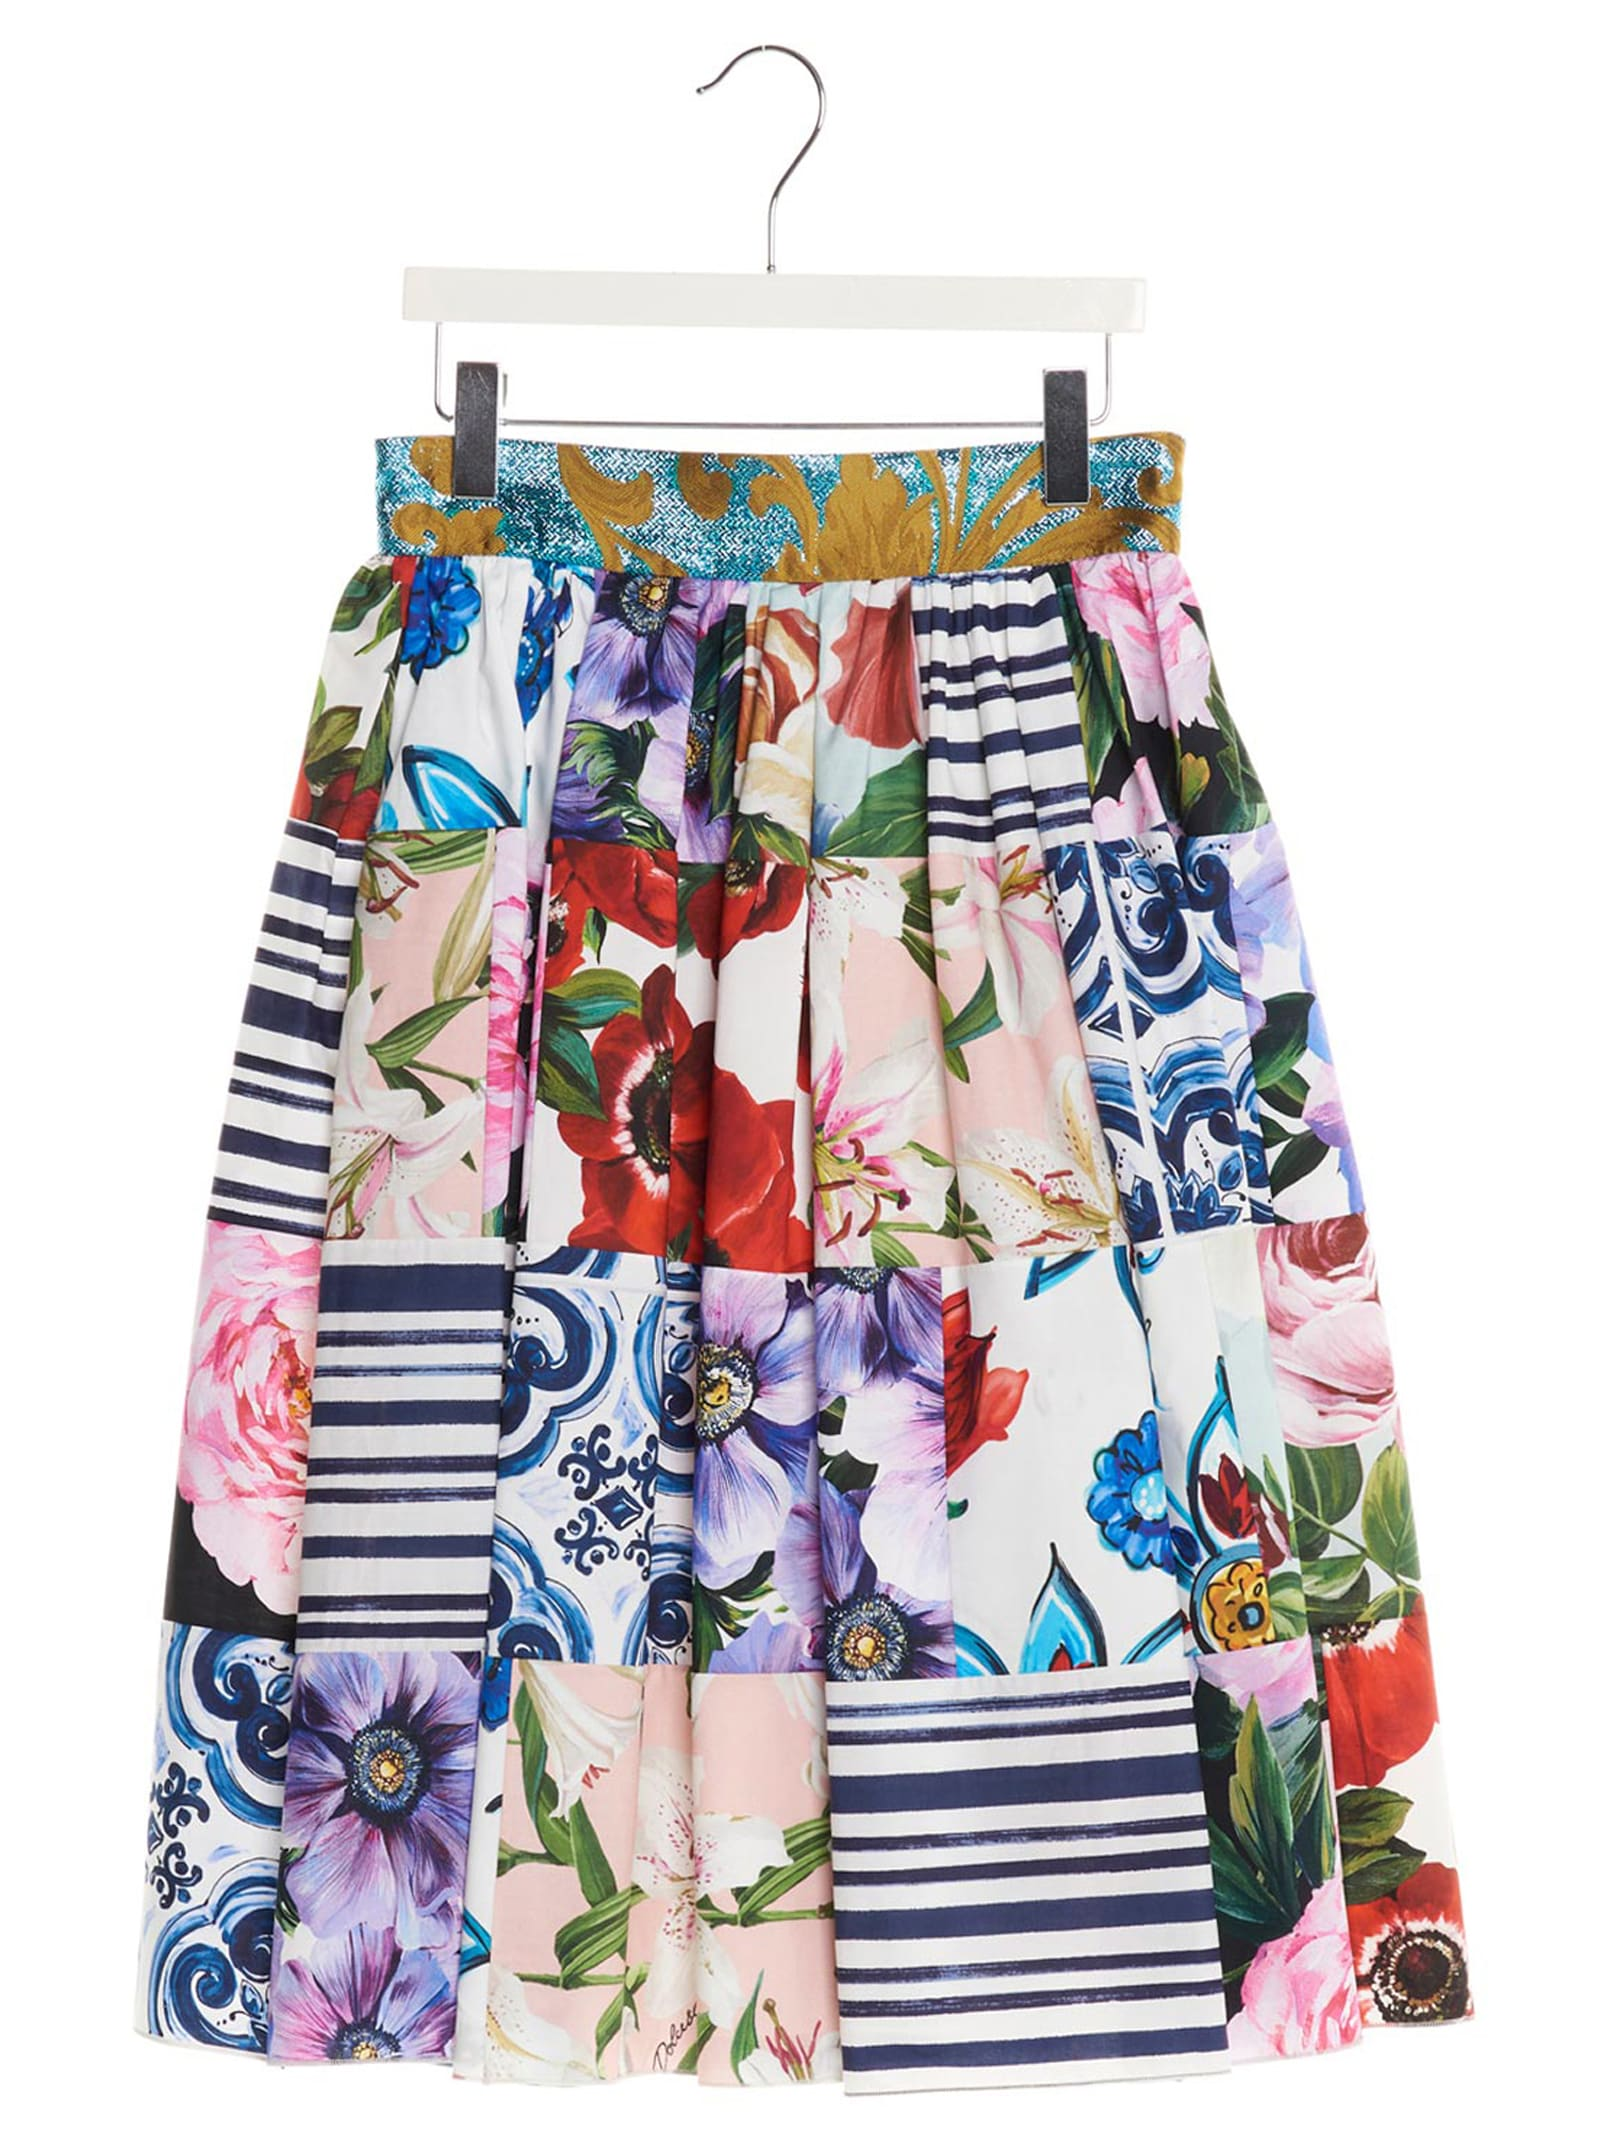 Dolce & Gabbana Skirts SKIRT